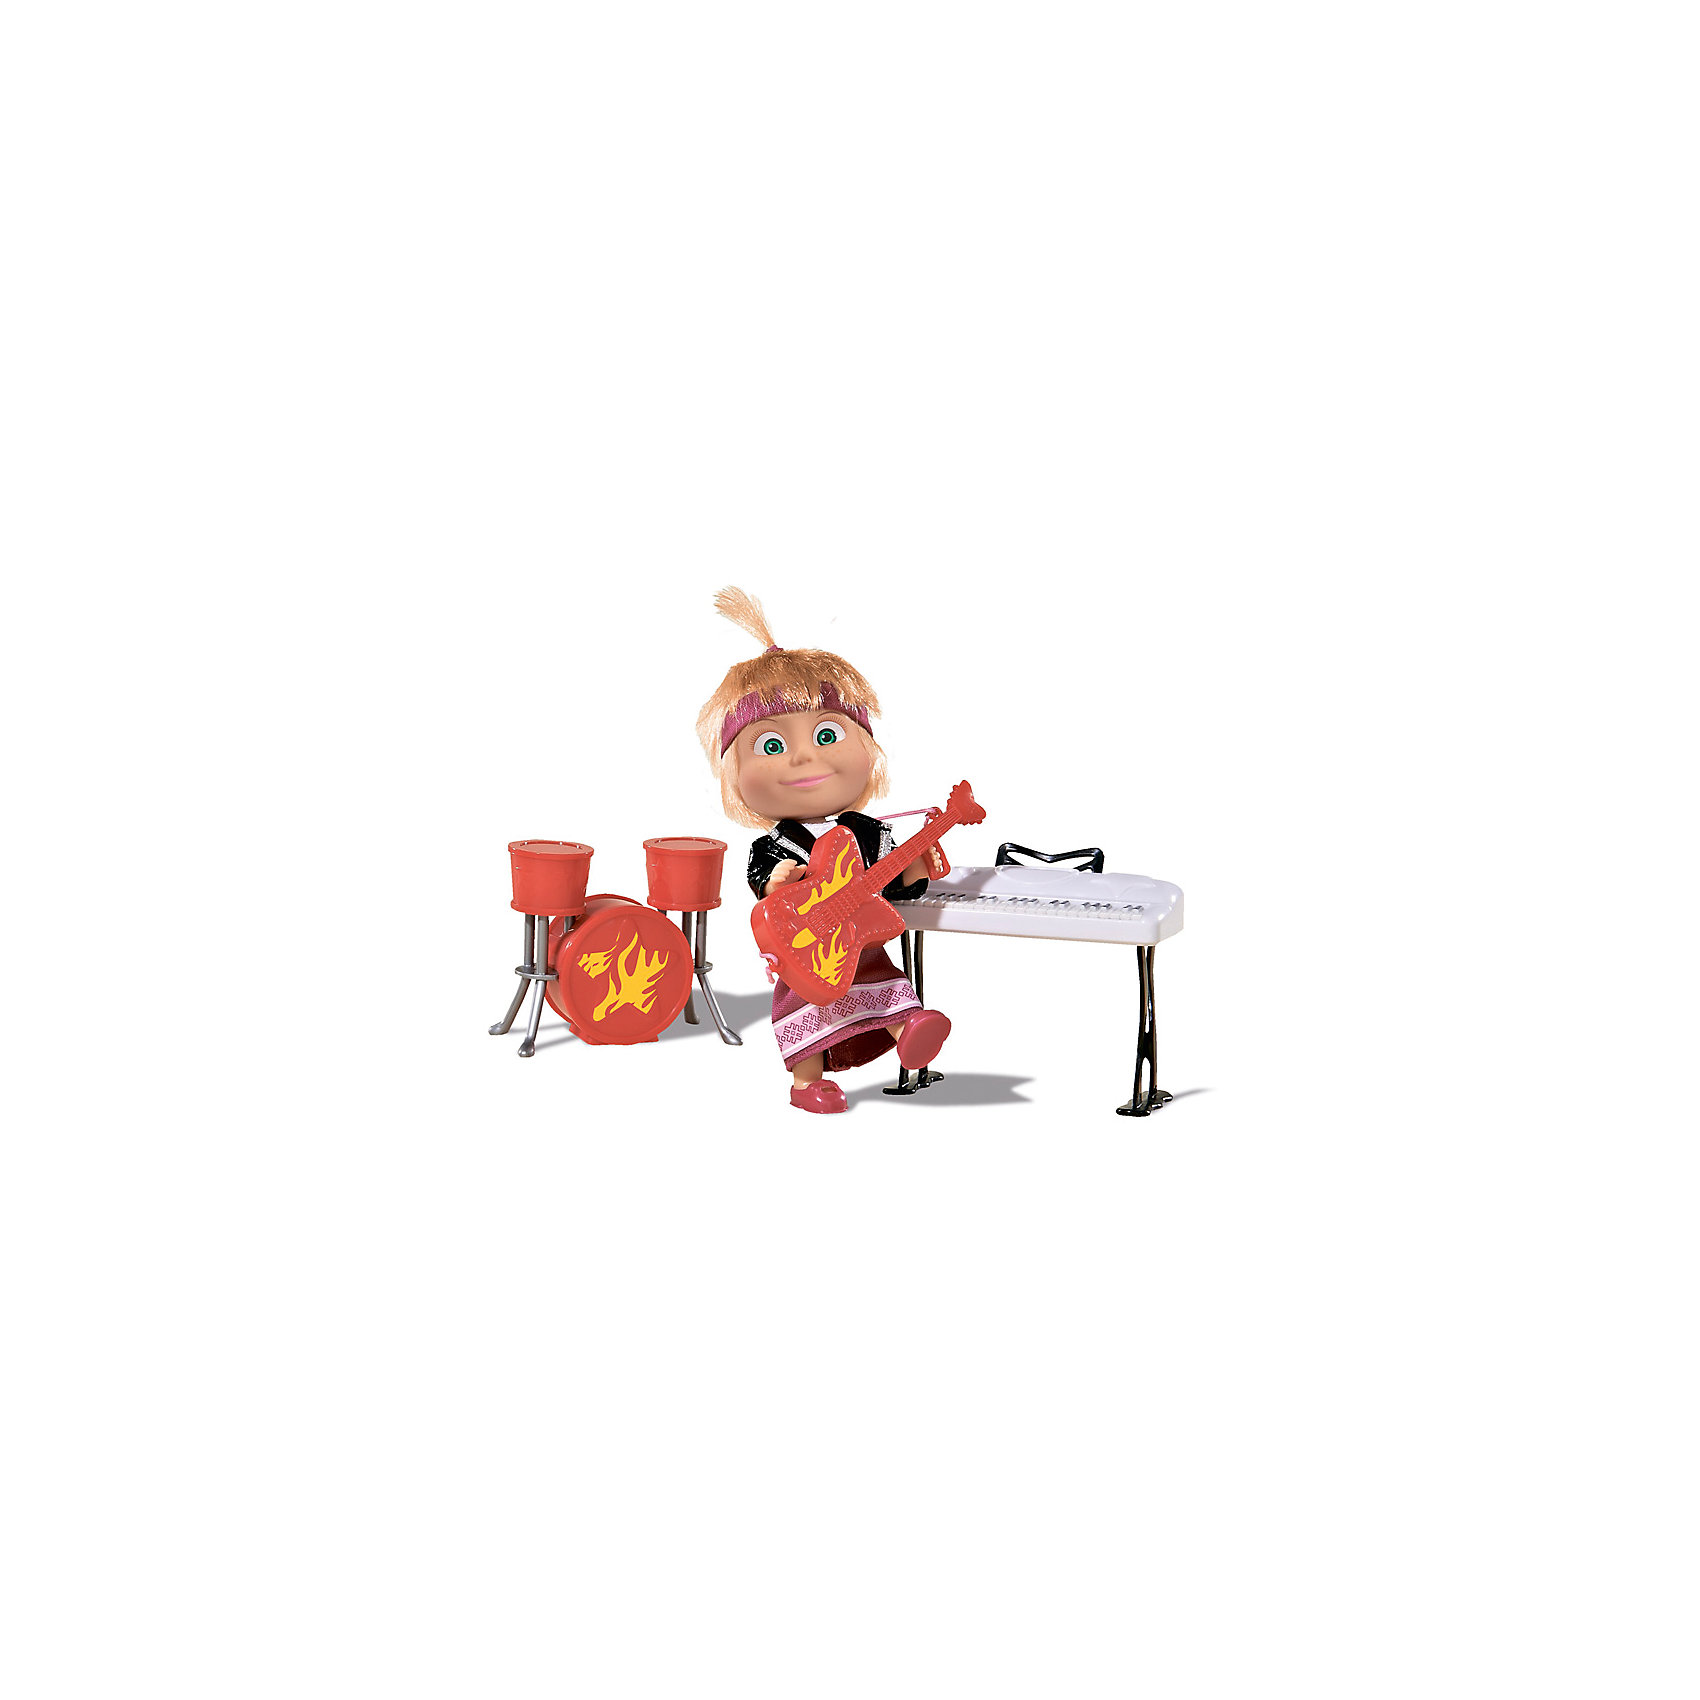 Кукла Маша в рок-наряде, Маша и Медведь, Simba